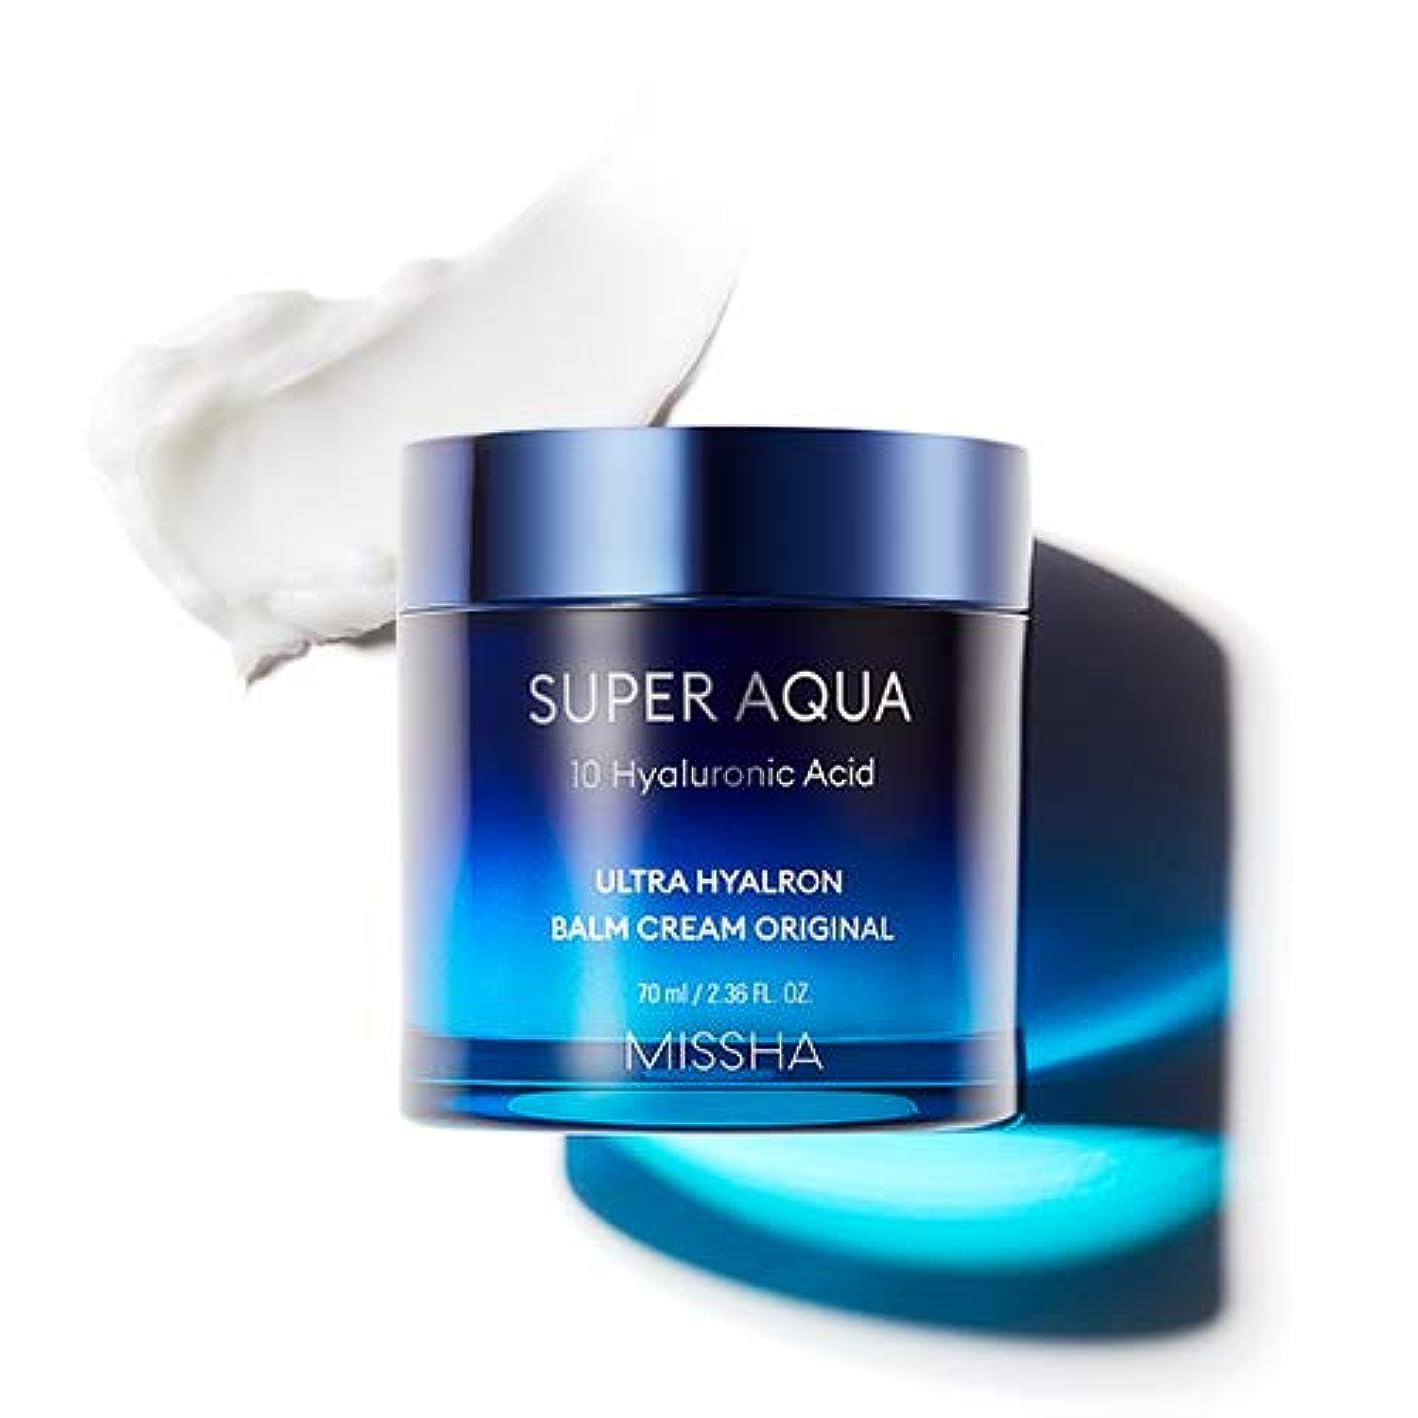 MISSHA Super Aqua Ultra Hyalron Balm Cream Original ミシャ スーパーアクア ウルトラ ヒアルロン バーム クリーム オリジナル 70ml [並行輸入品]